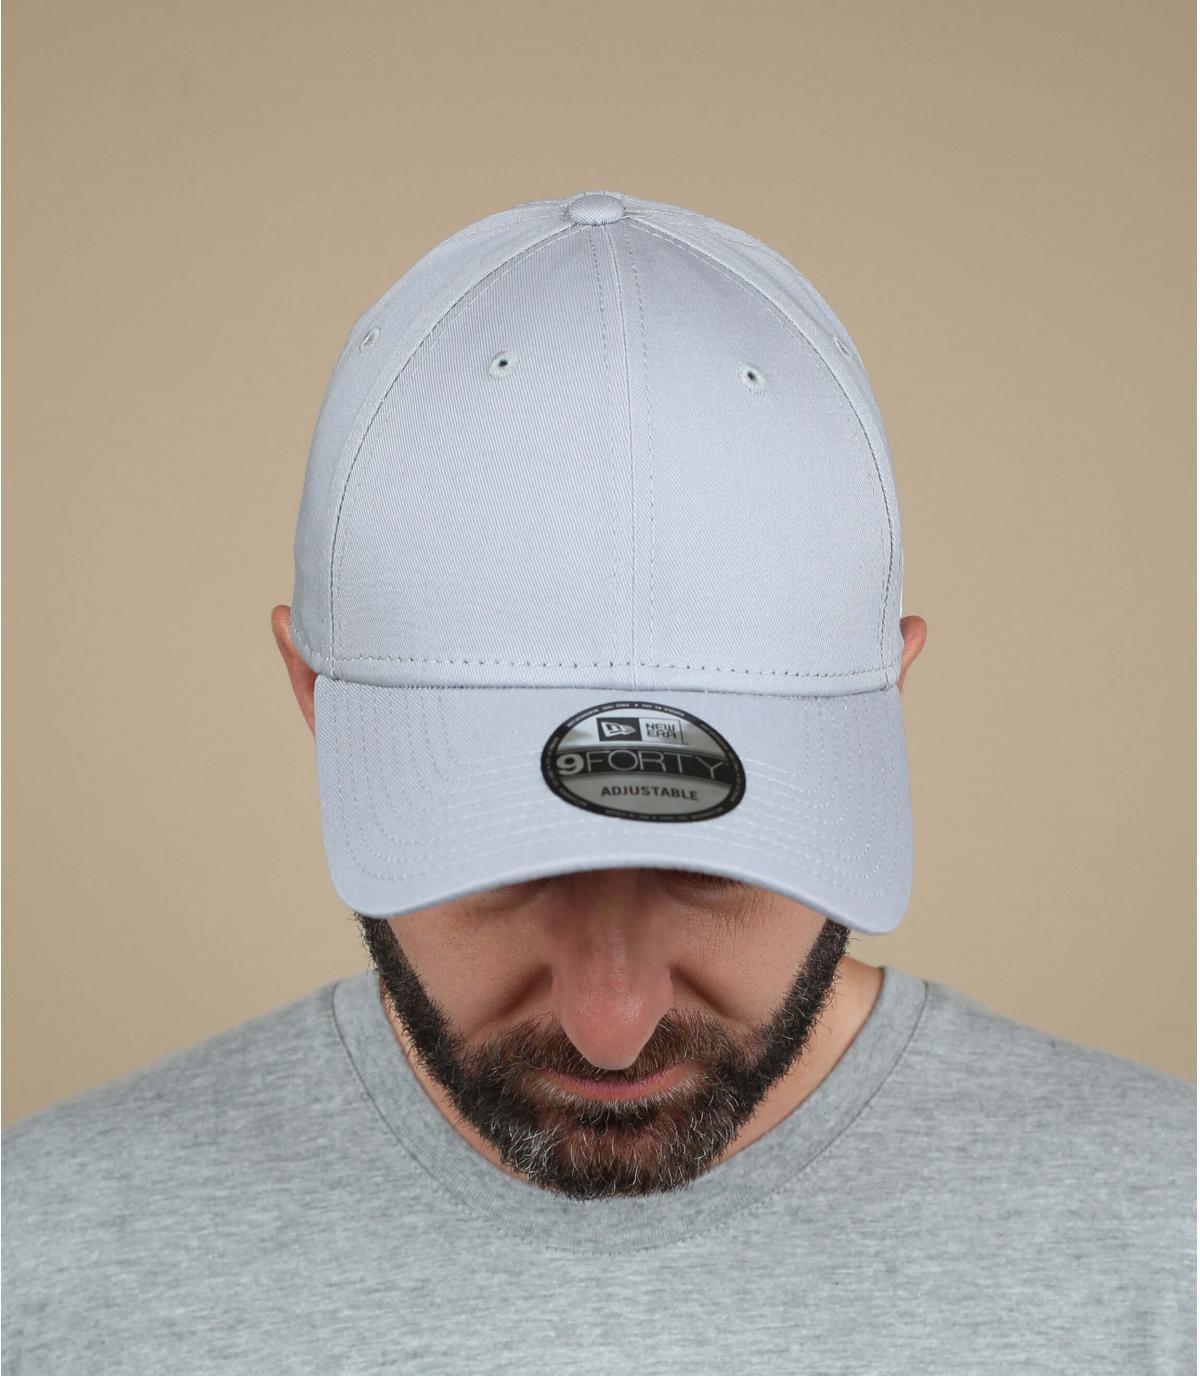 Grey curved visor cap